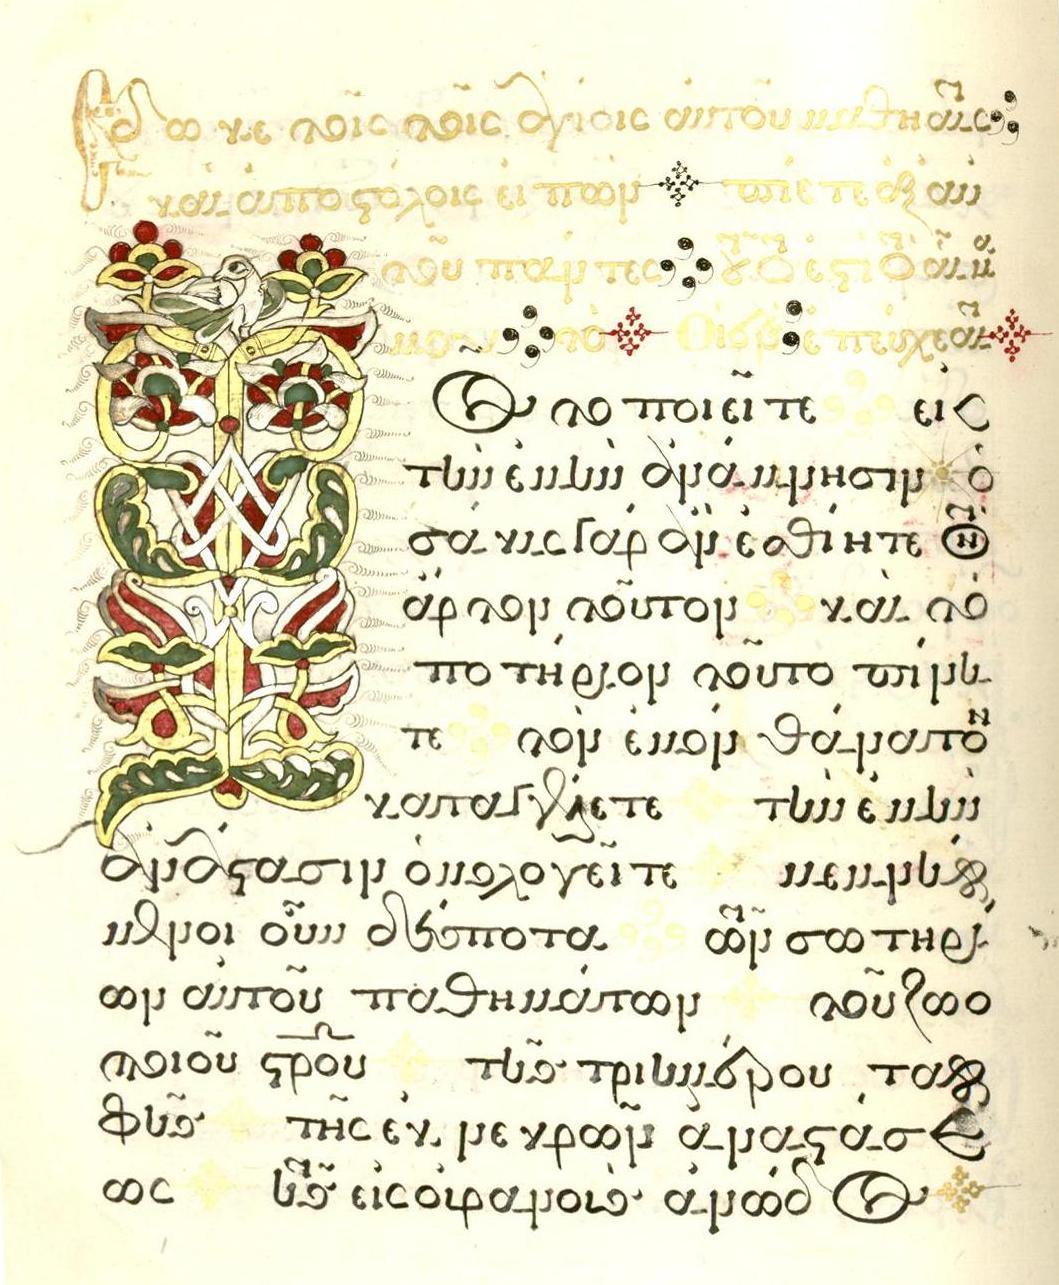 Manuscris, fila 43 miniata verso